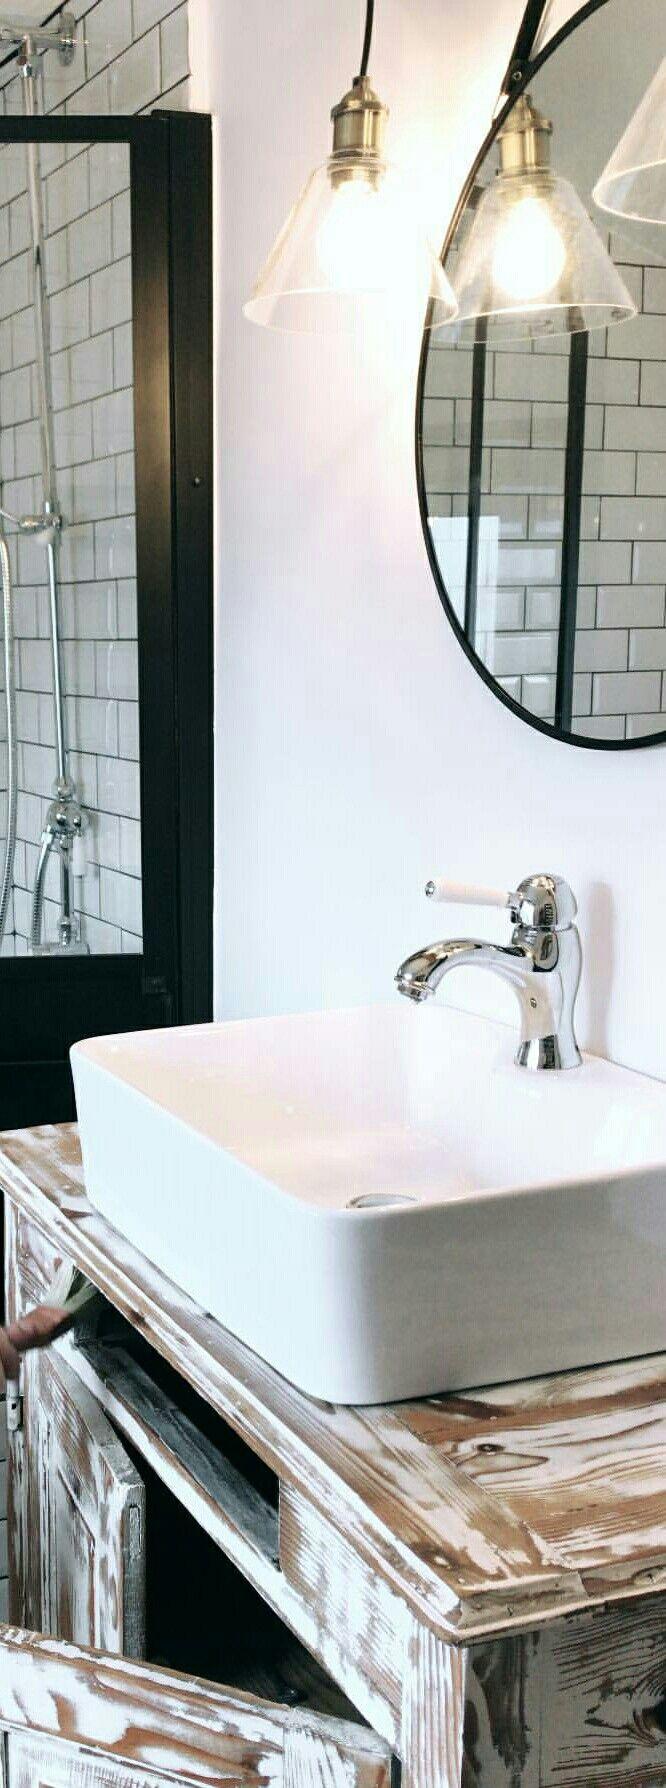 Salle De Bain Hipster ~ the 47 best salle de bain images on pinterest bathroom cabinets